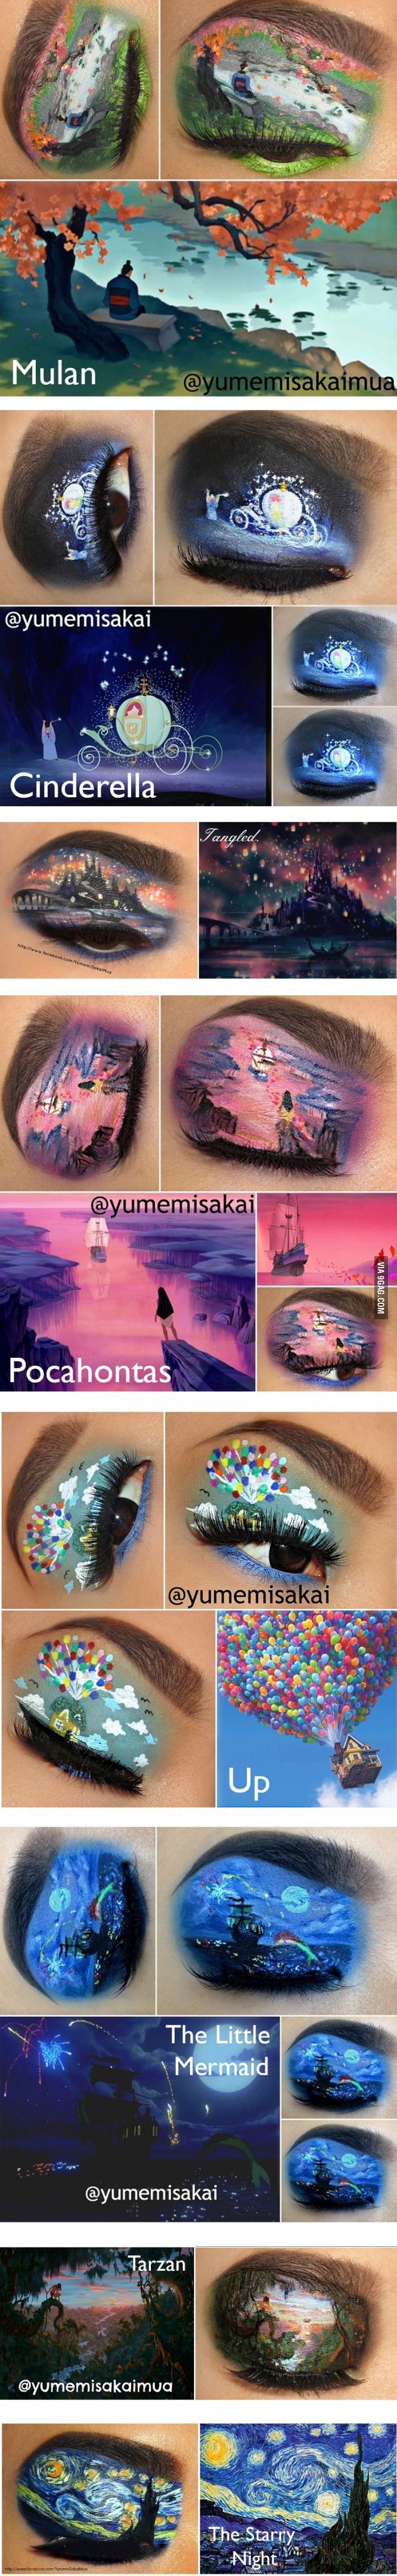 Disney (and other) Eye Makeup Art